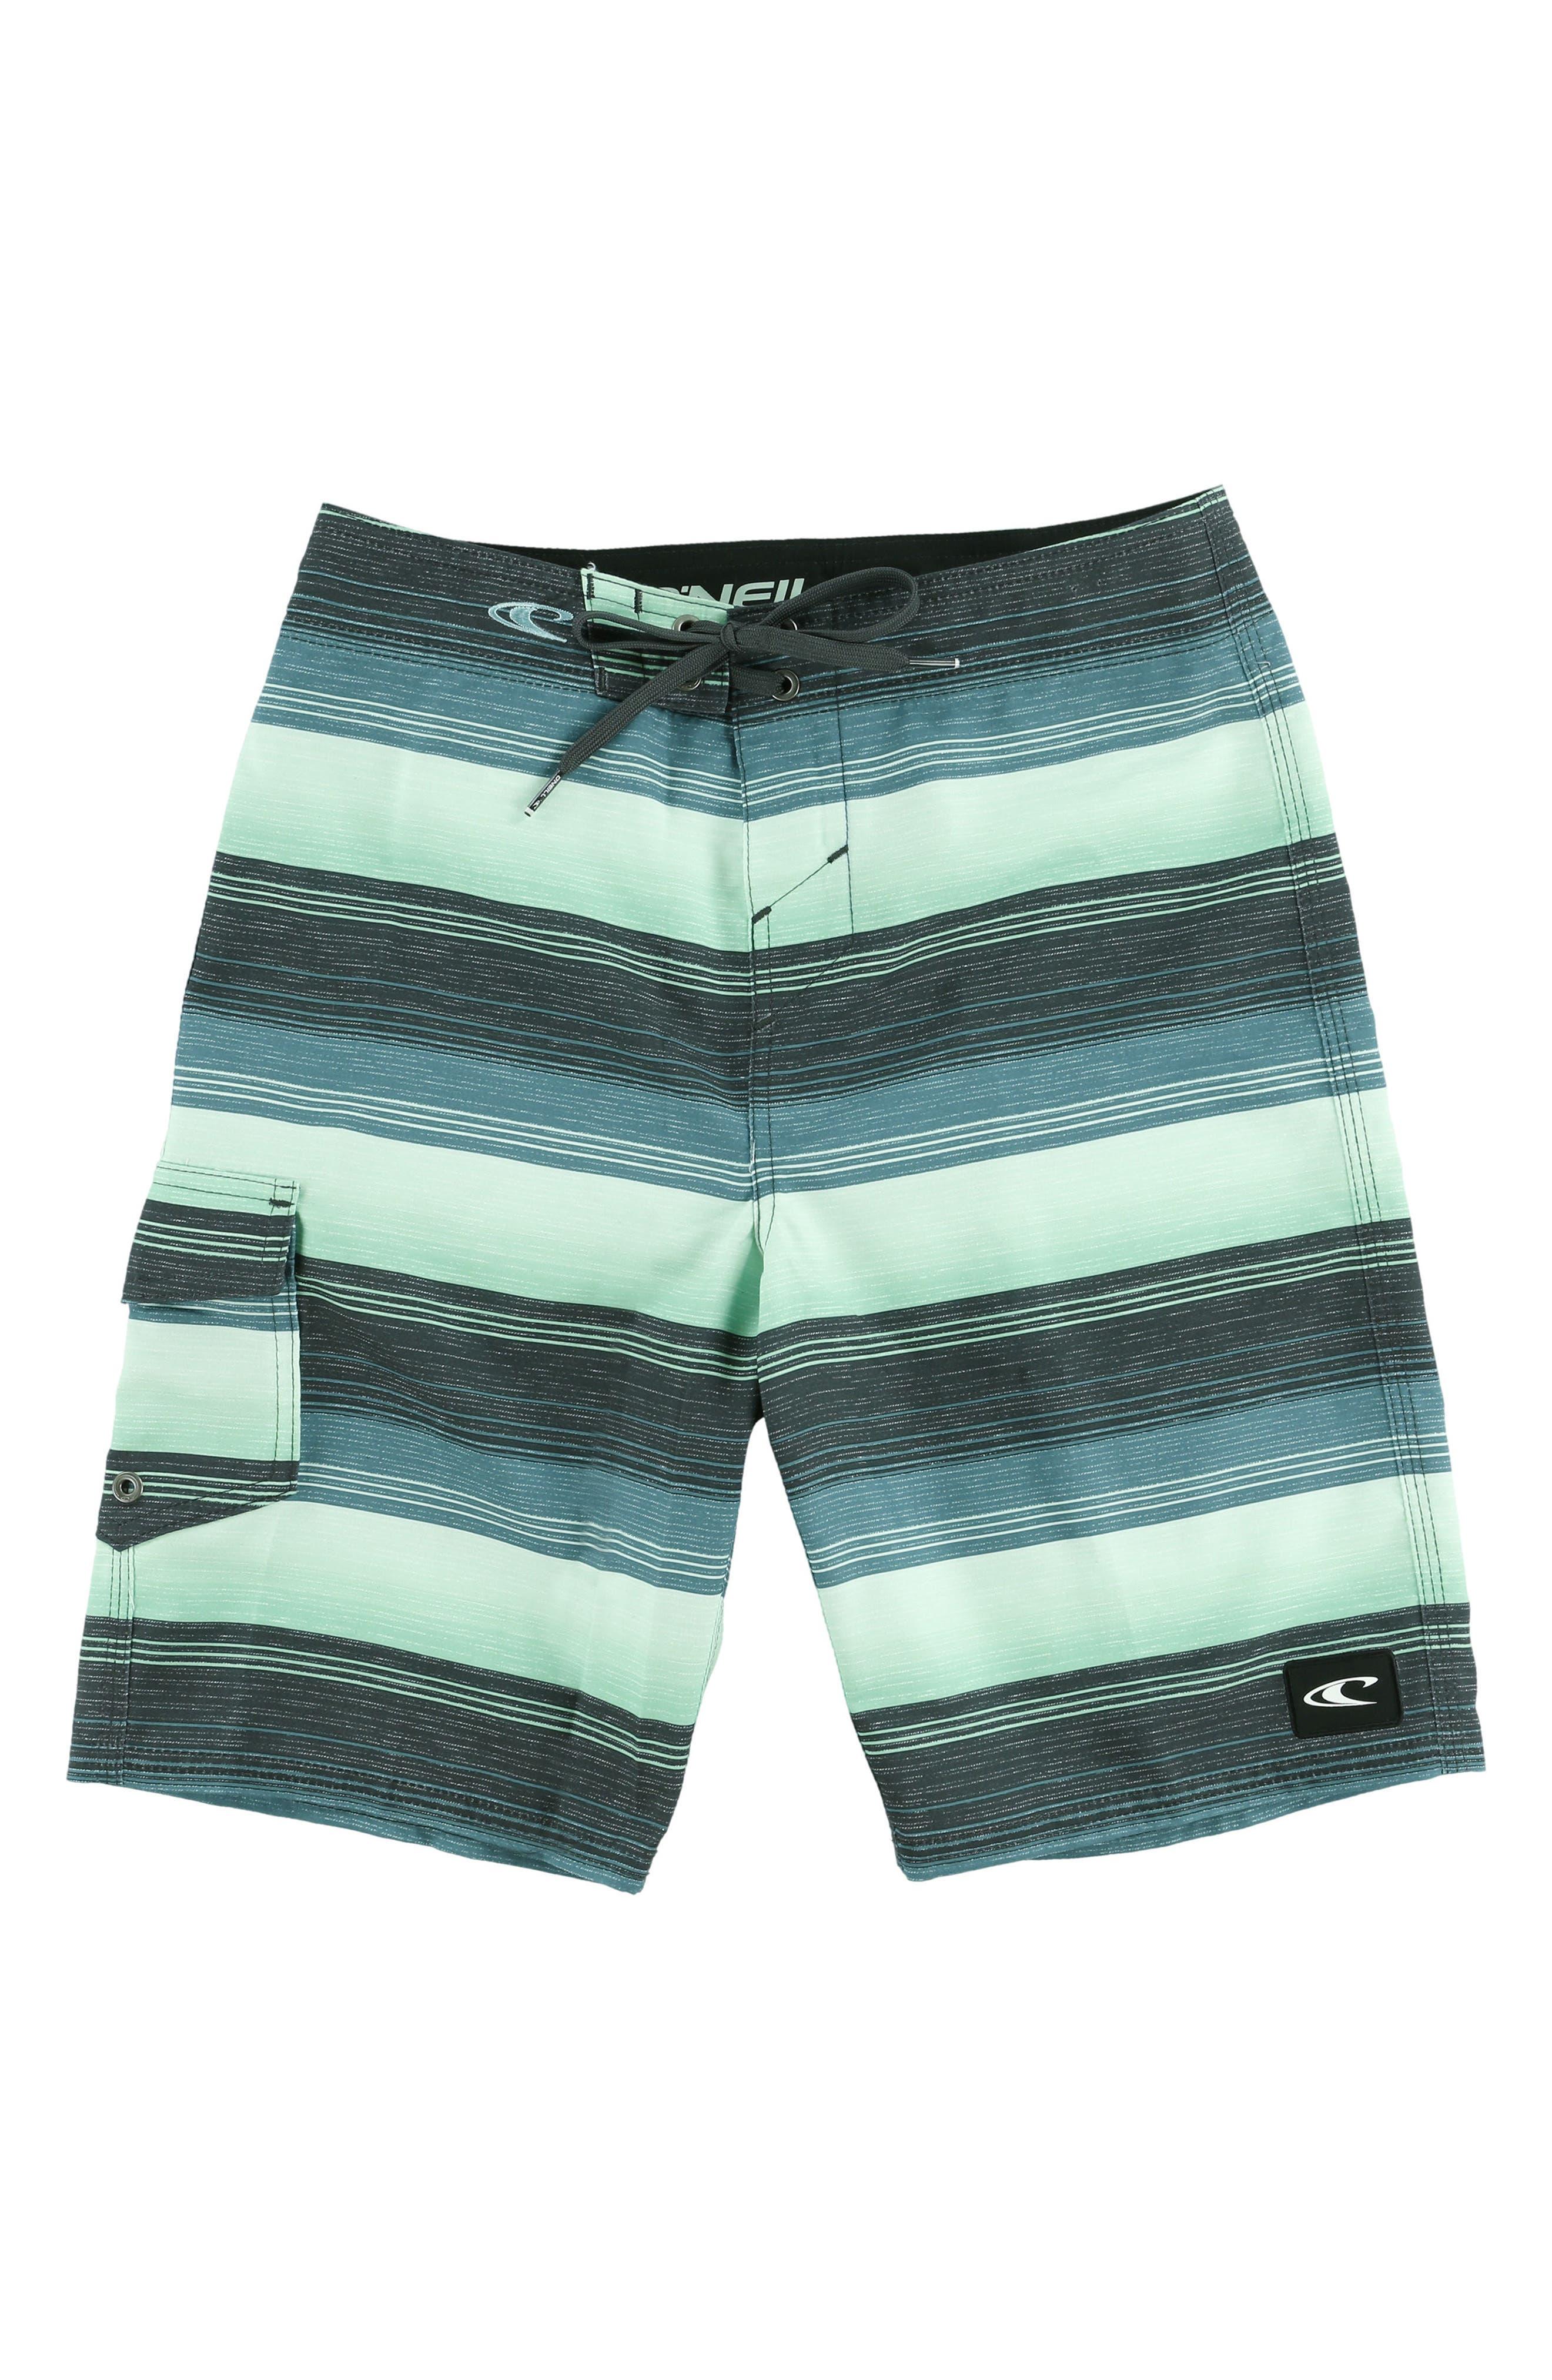 Santa Cruz Stripe Board Shorts,                             Main thumbnail 1, color,                             Turq